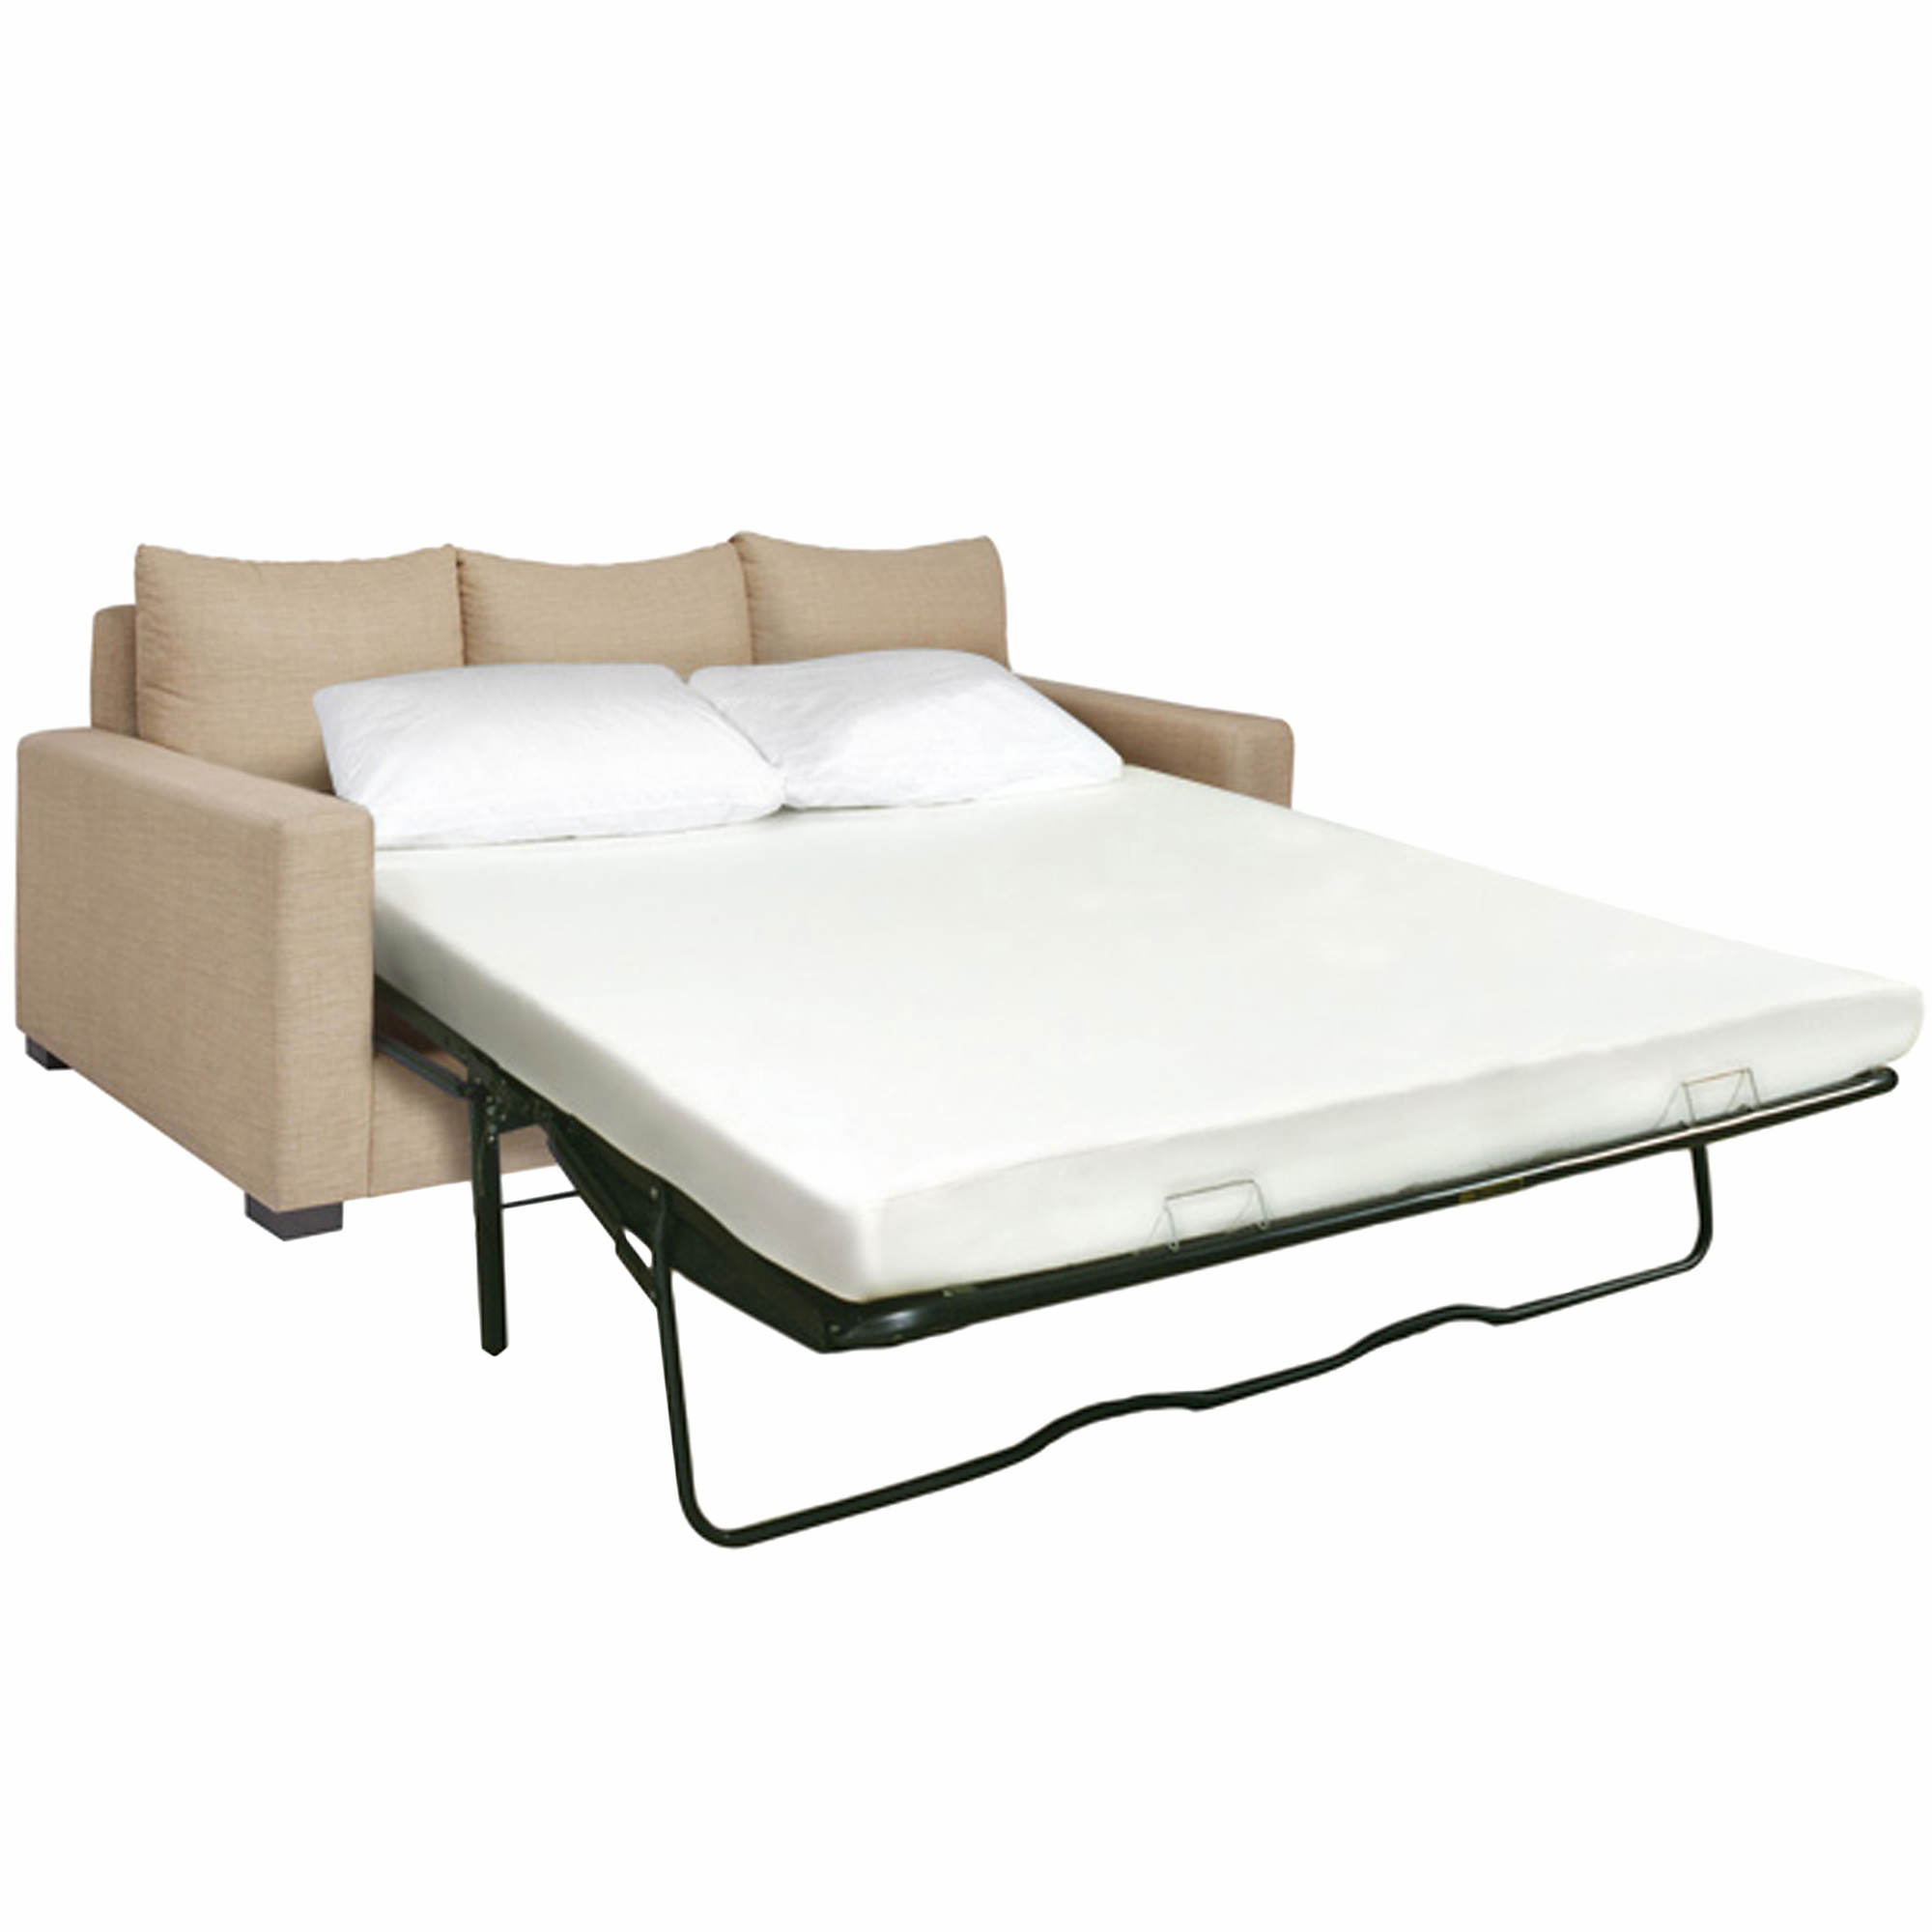 Cradlesoft Axiom I Full Size 4 5 Sleep Sofa Replacement Mattress Bjs Whole Club